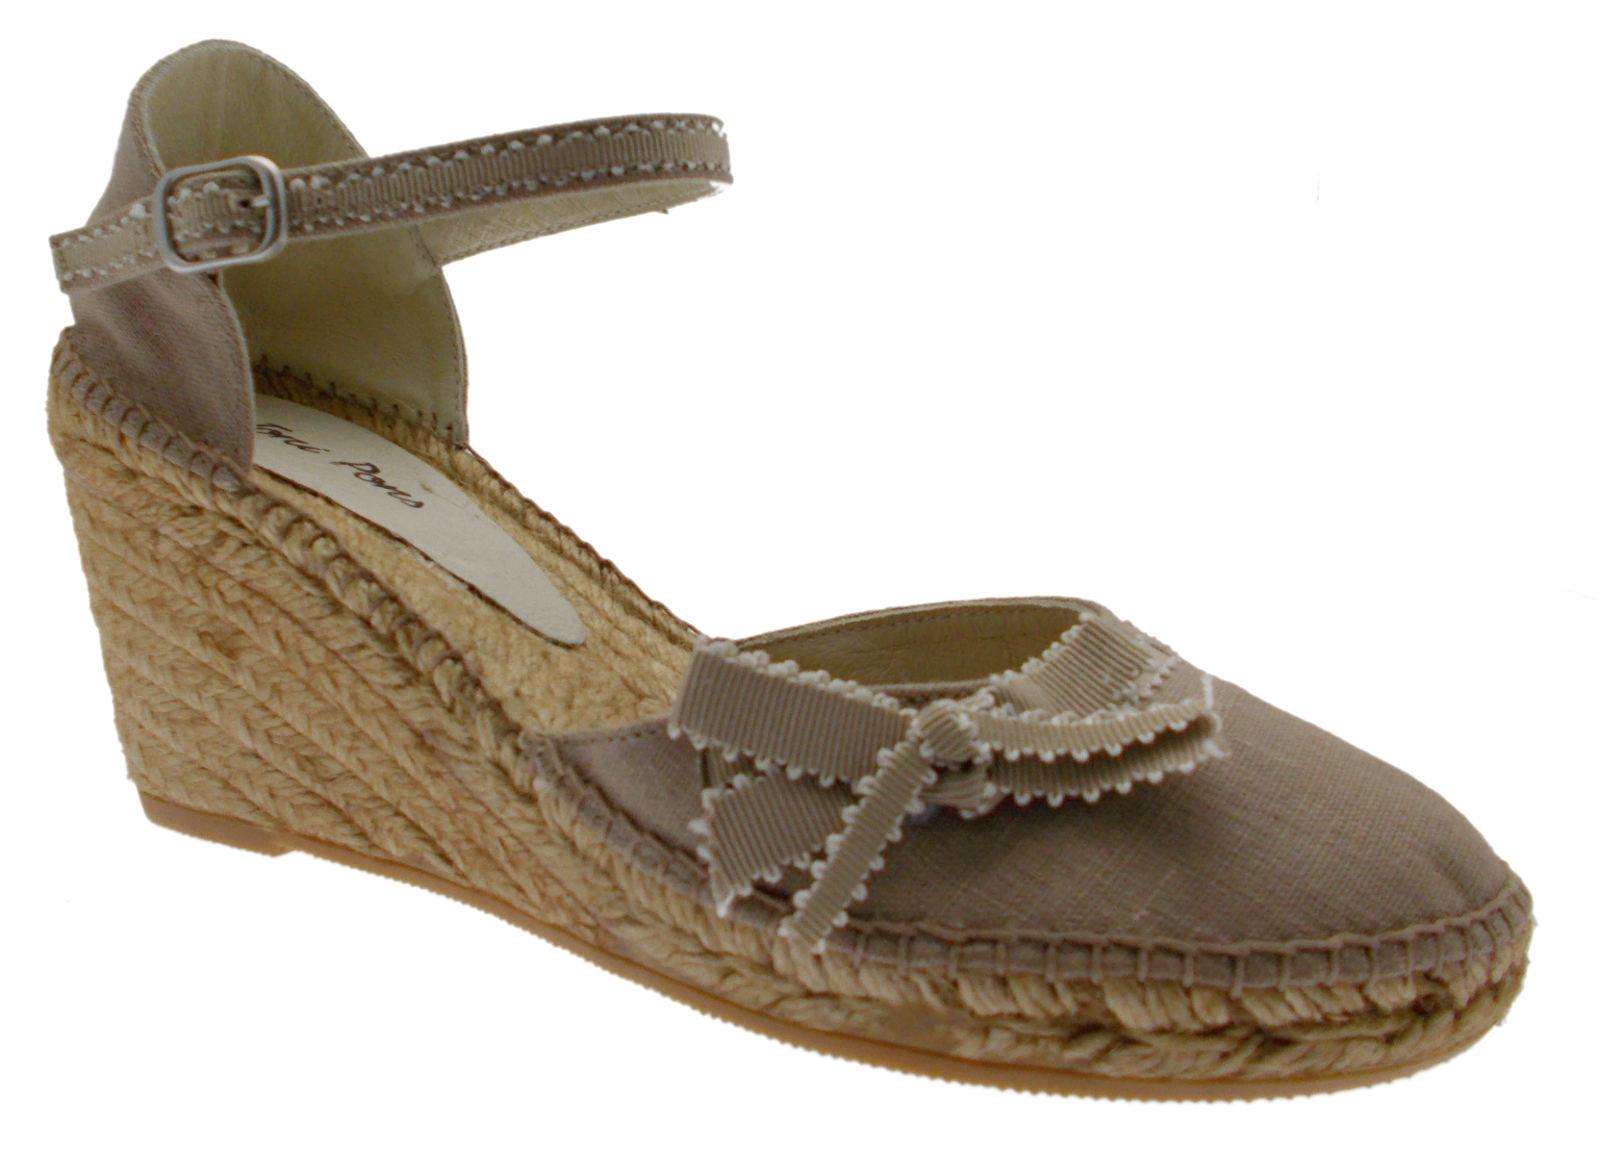 shoes sandal beige rope pedra closed wedge art FINA strap Toni Pons